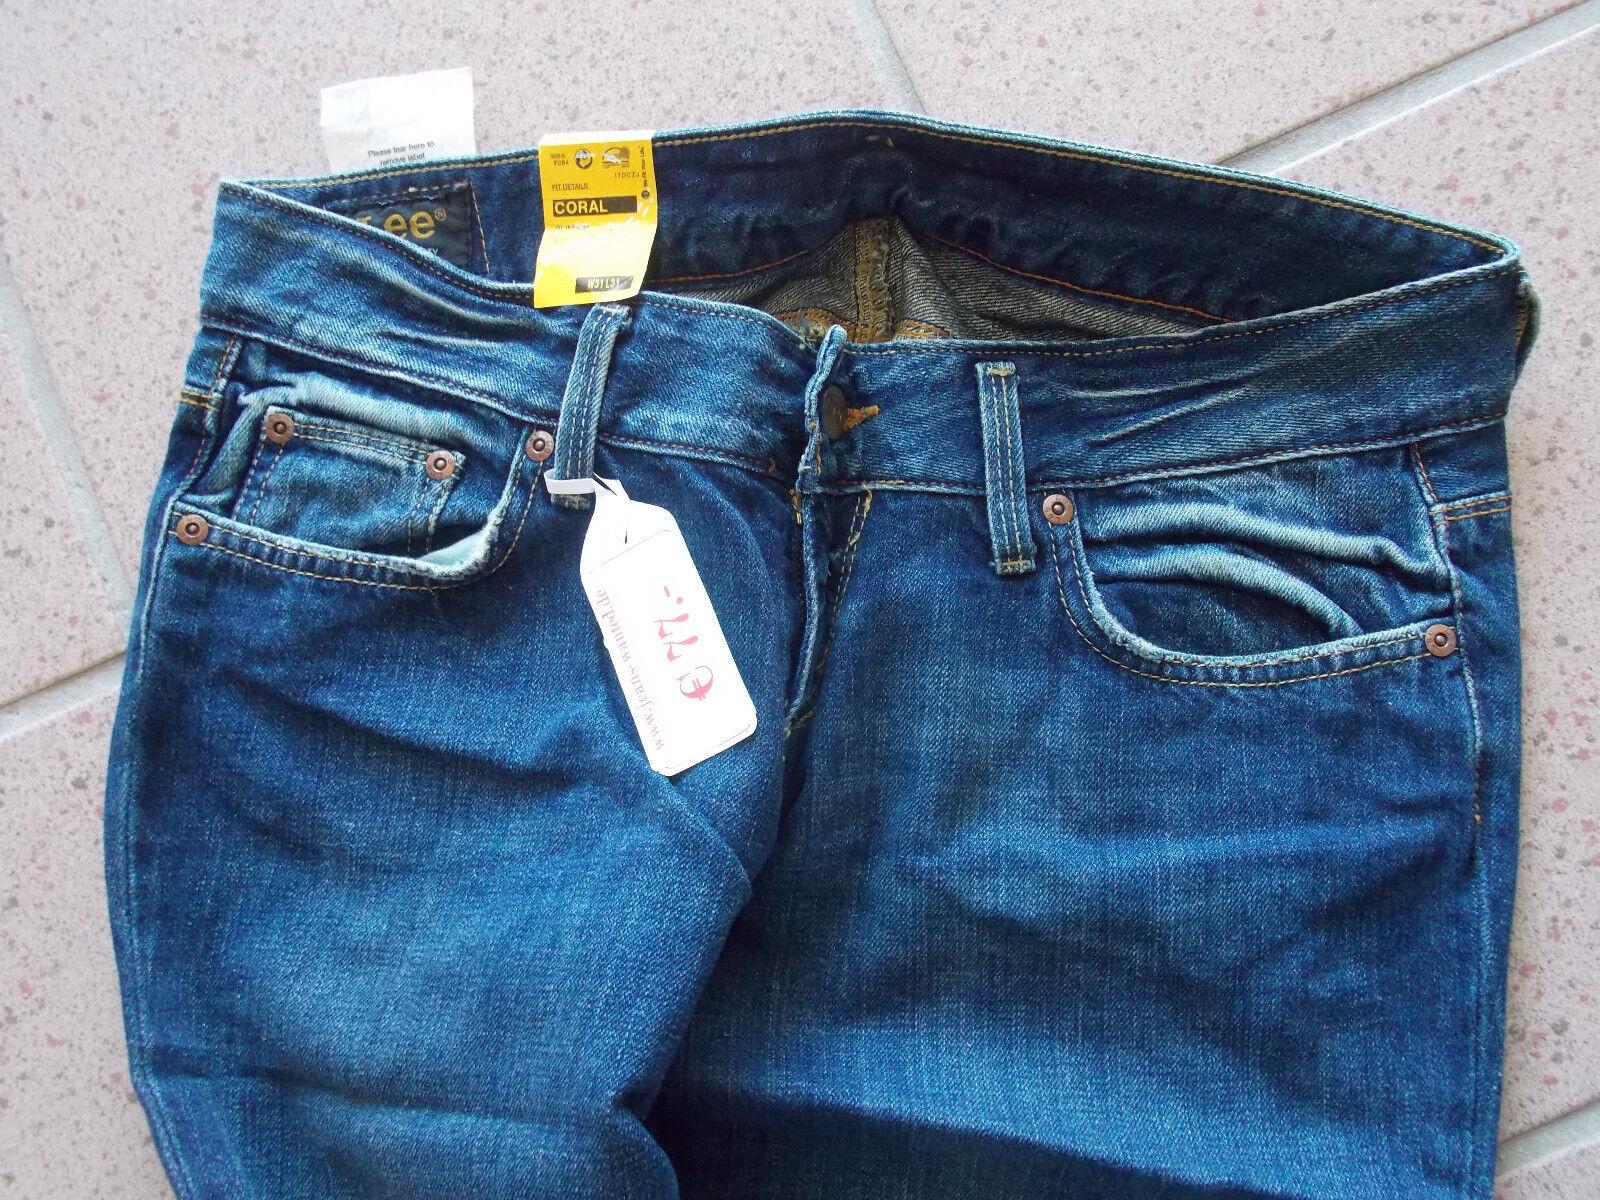 ■■■ LEE Jeans Coral Damenjeans Stiefelcut neu ungetragen 28 28 28 35  ■■■ 236639